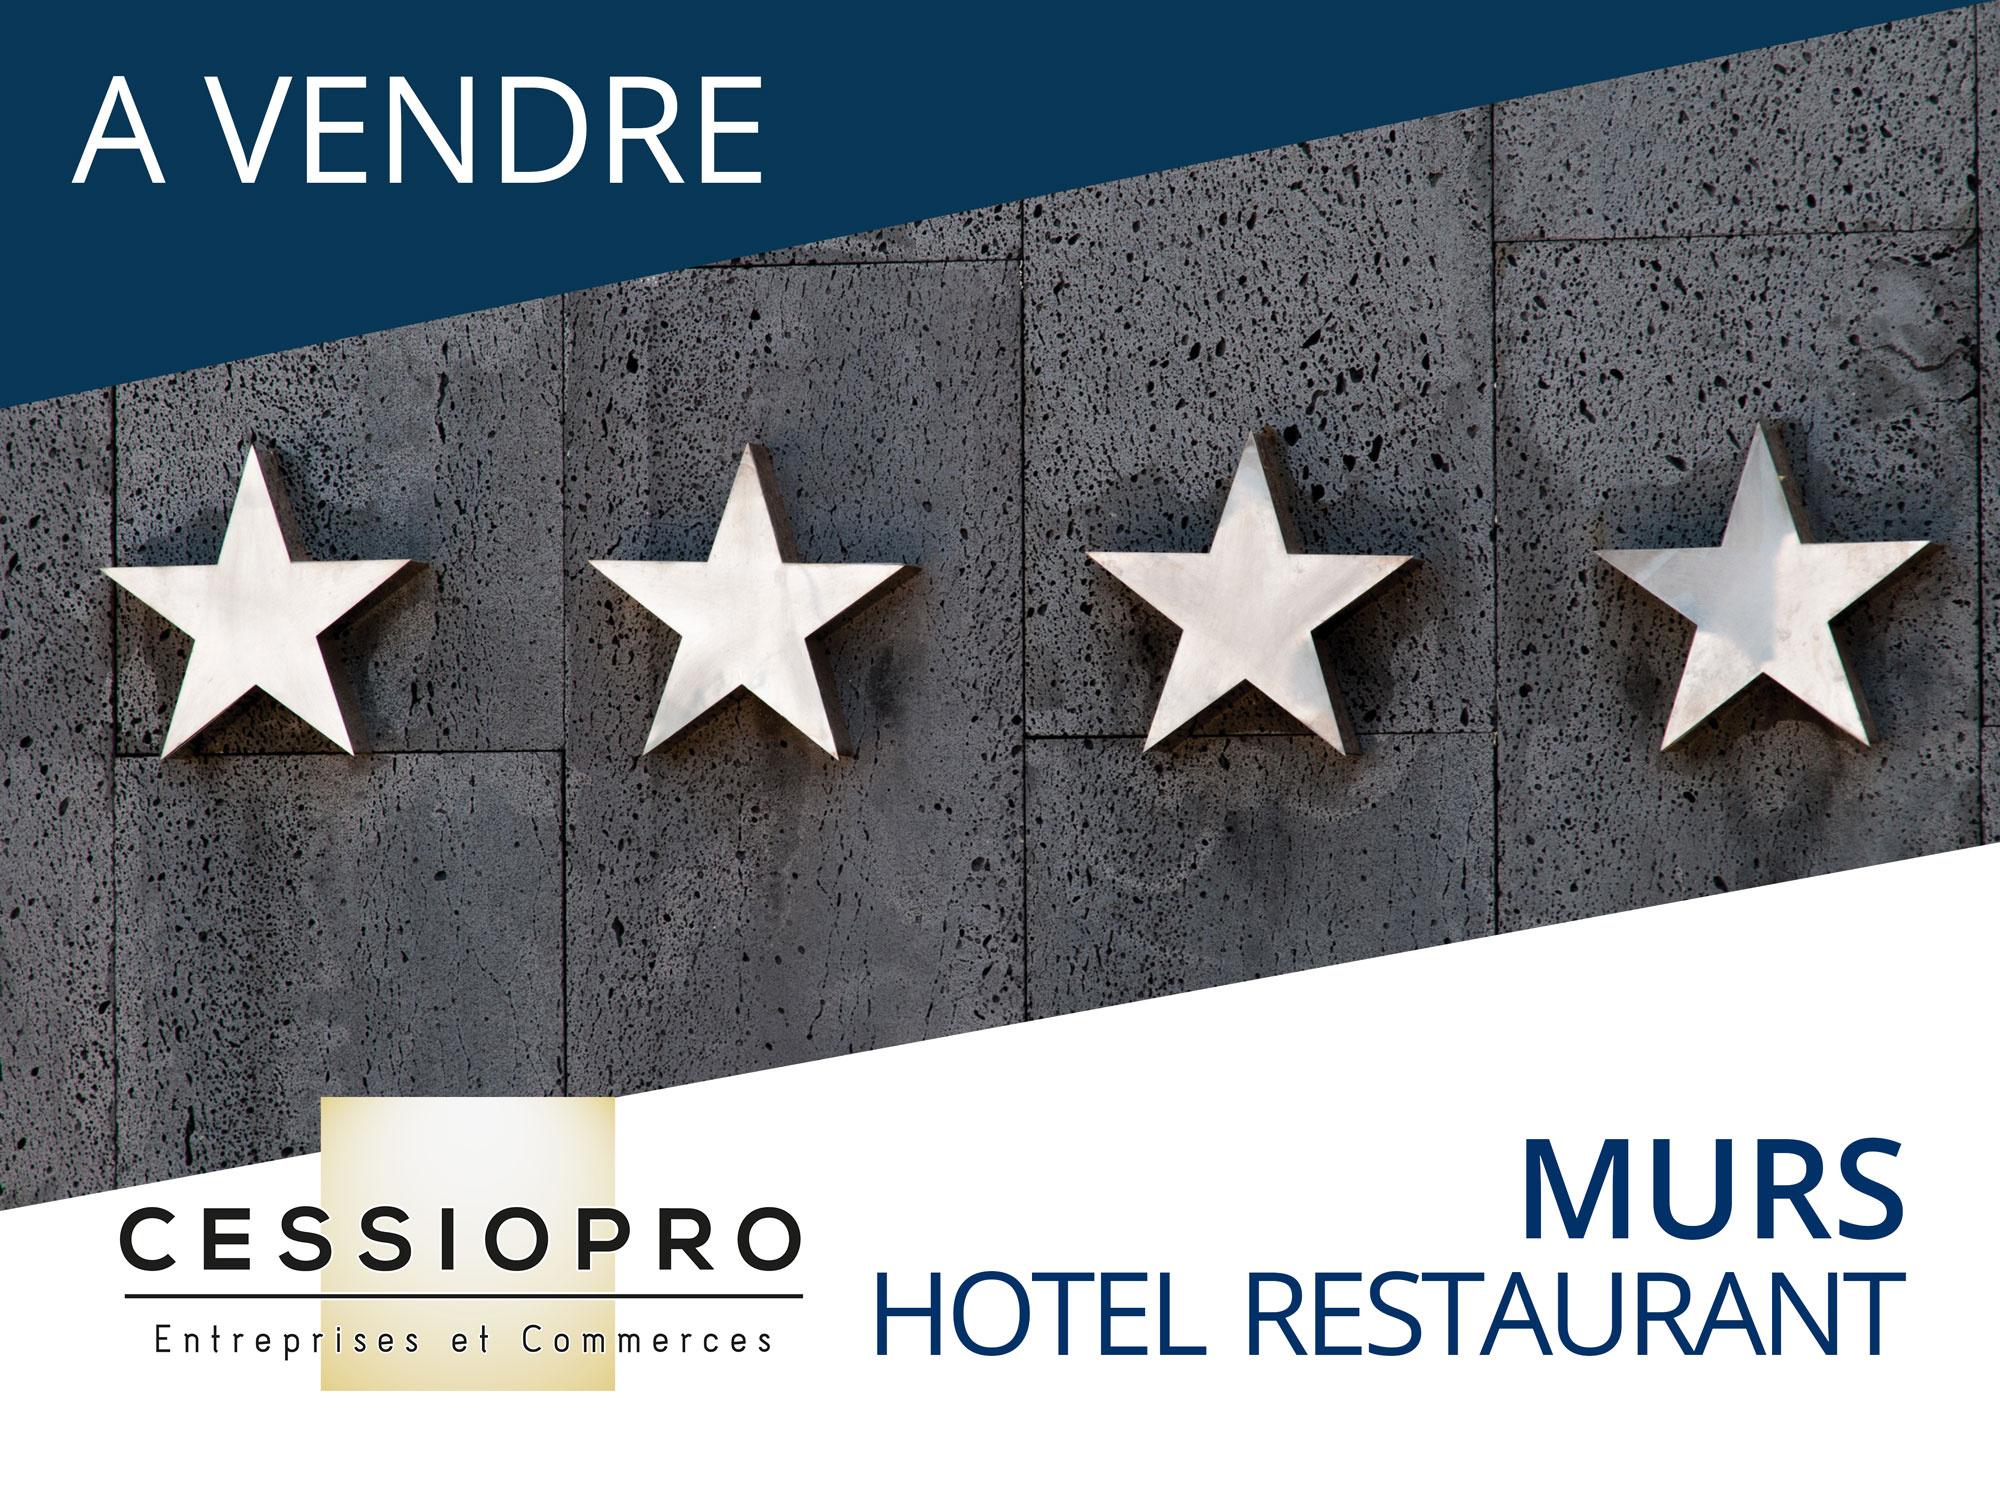 MURS ET FONDS D'UN HOTEL RESTAURANT *** PROCHE DU LITTORAL - Hôtel Restaurant